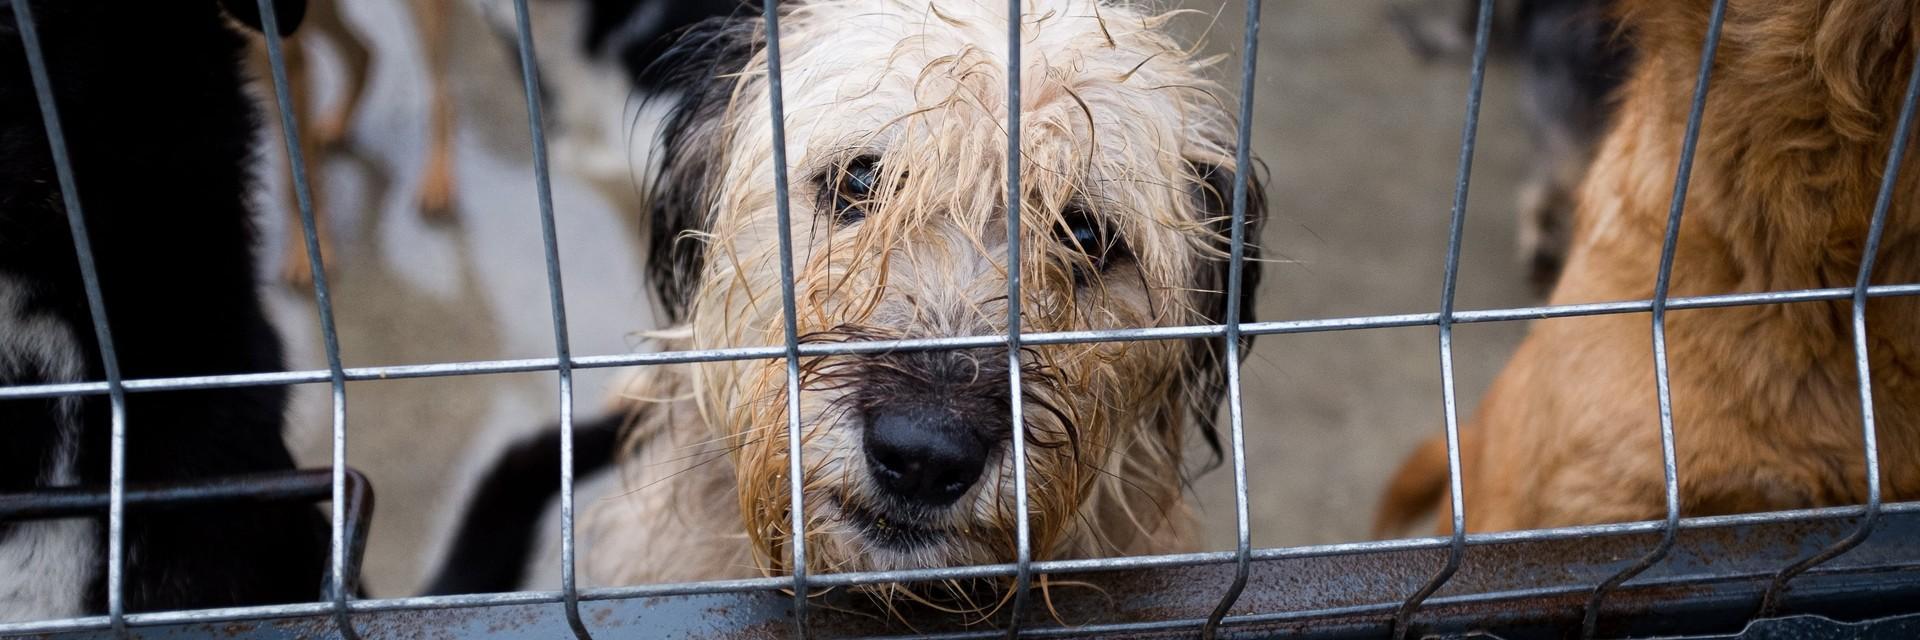 Straßenhund in Moldawien